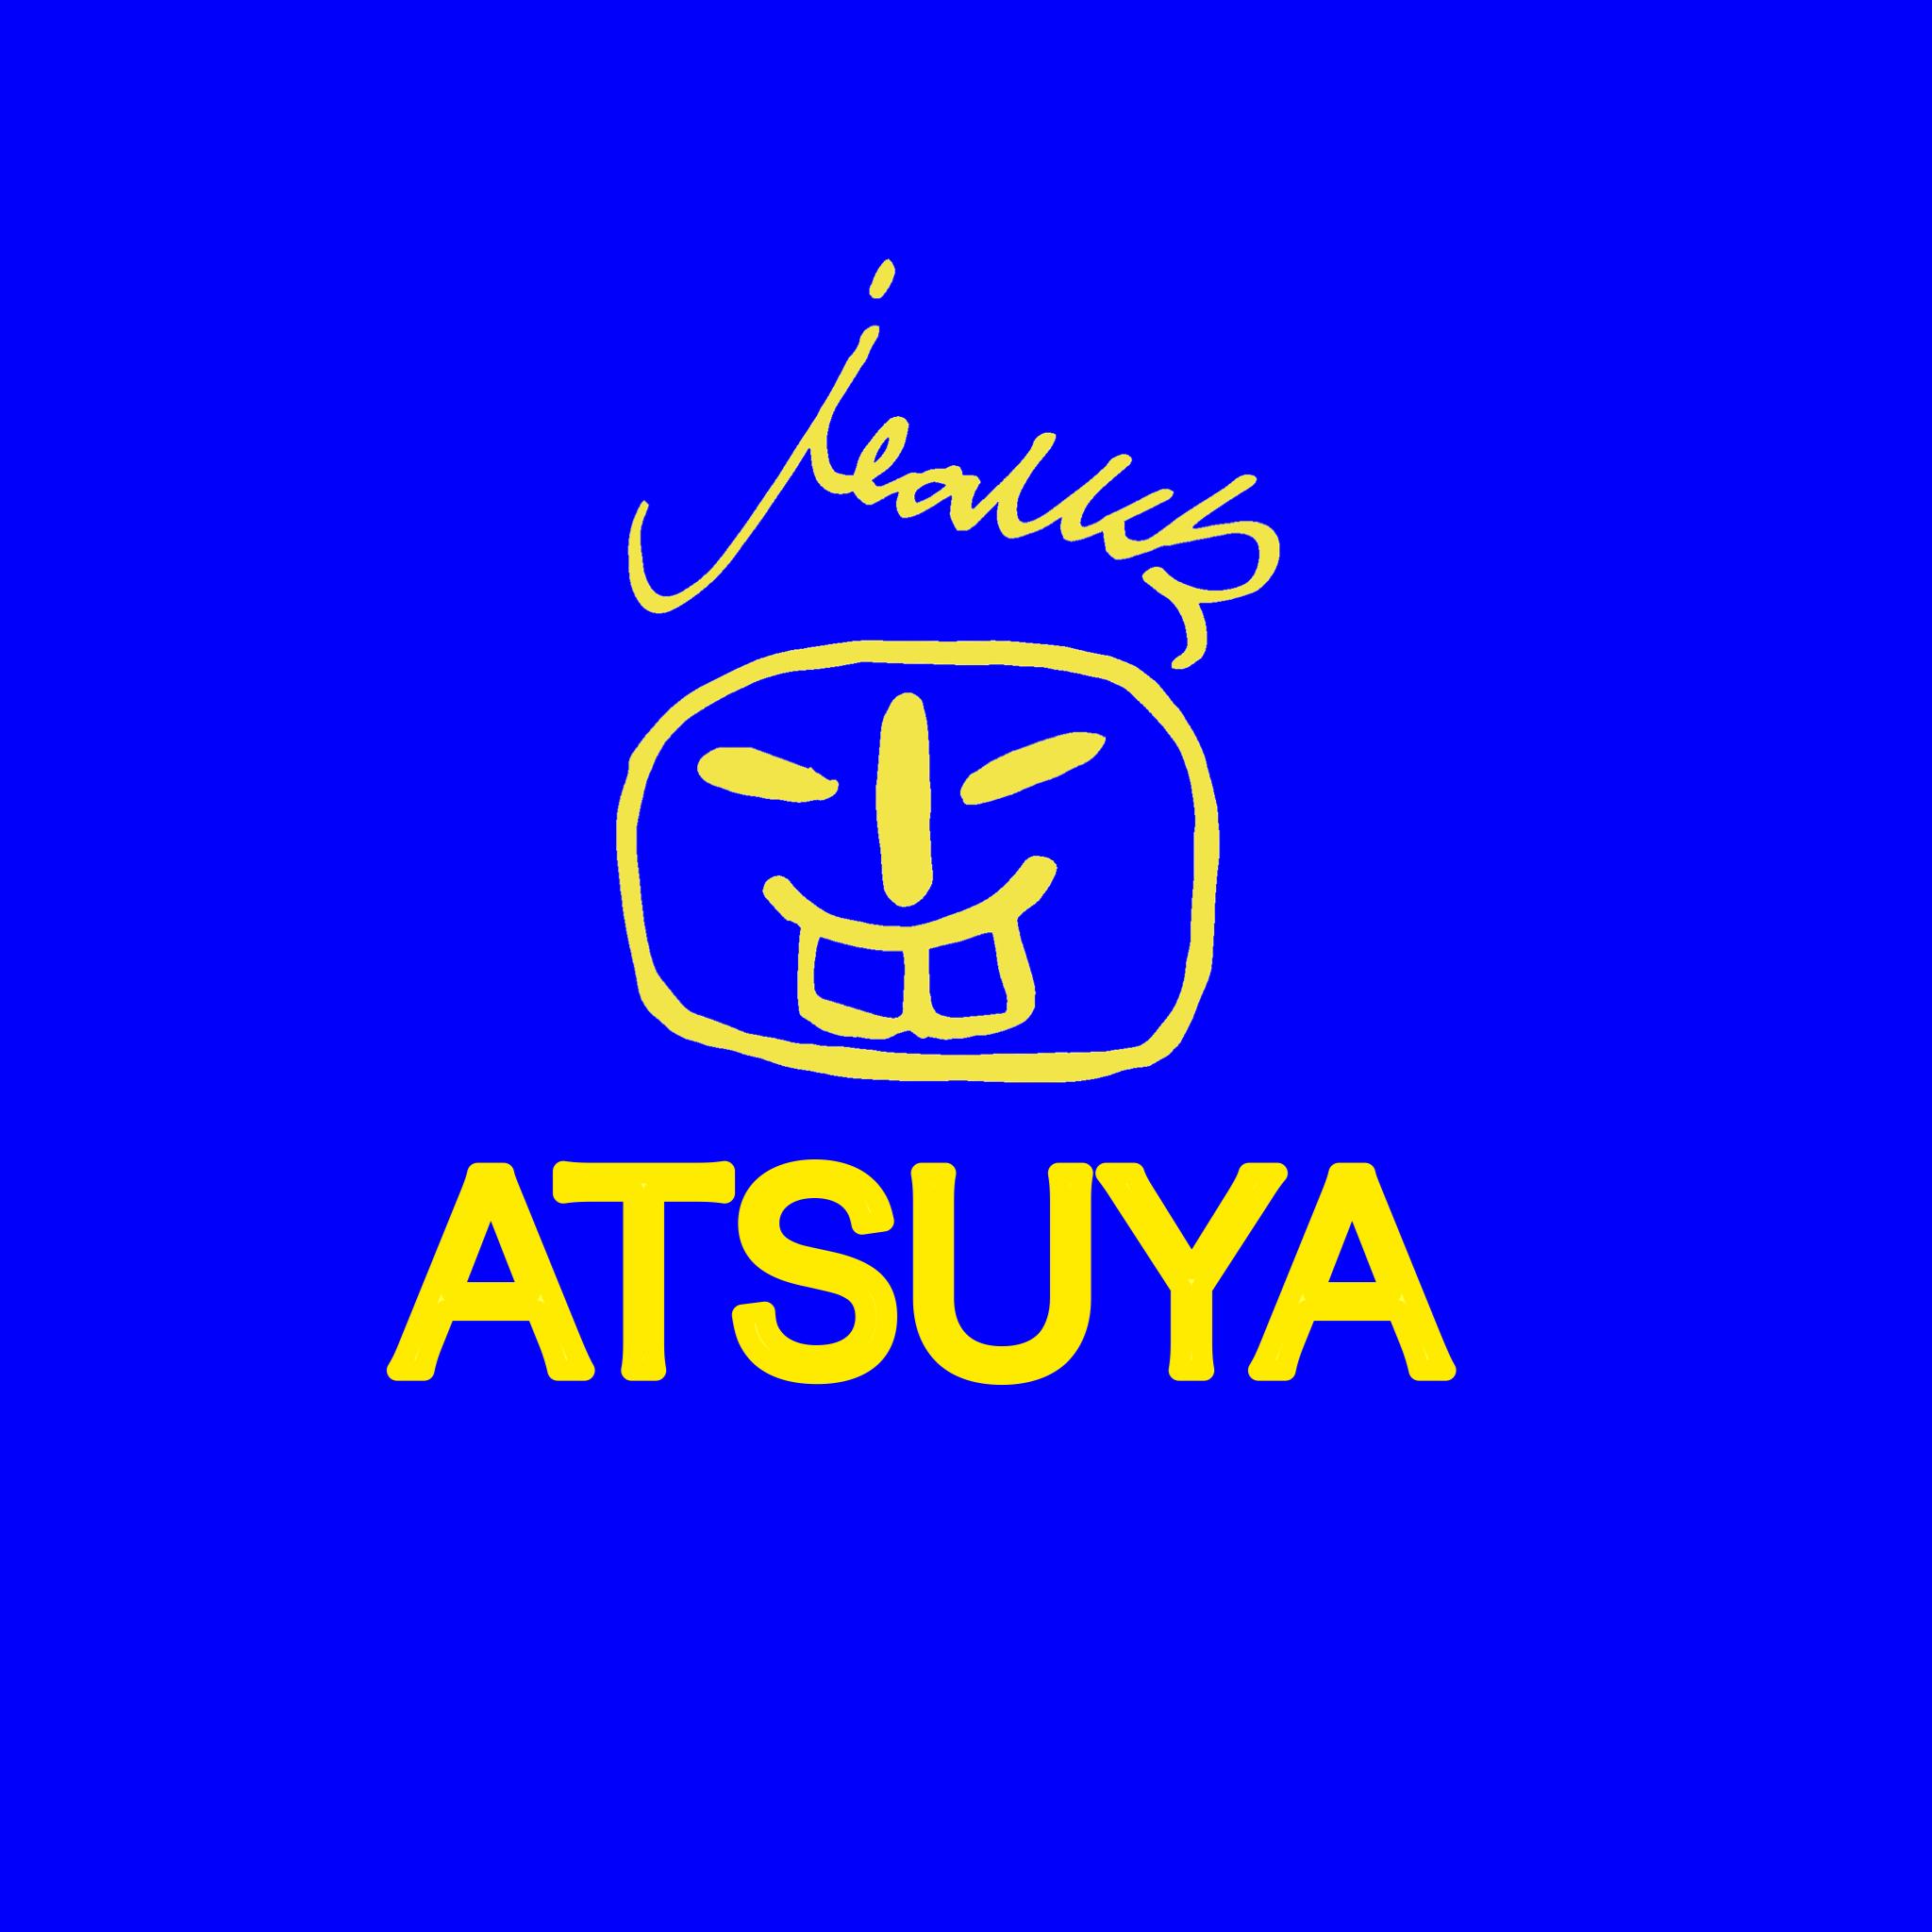 CDショップ ATSUYA